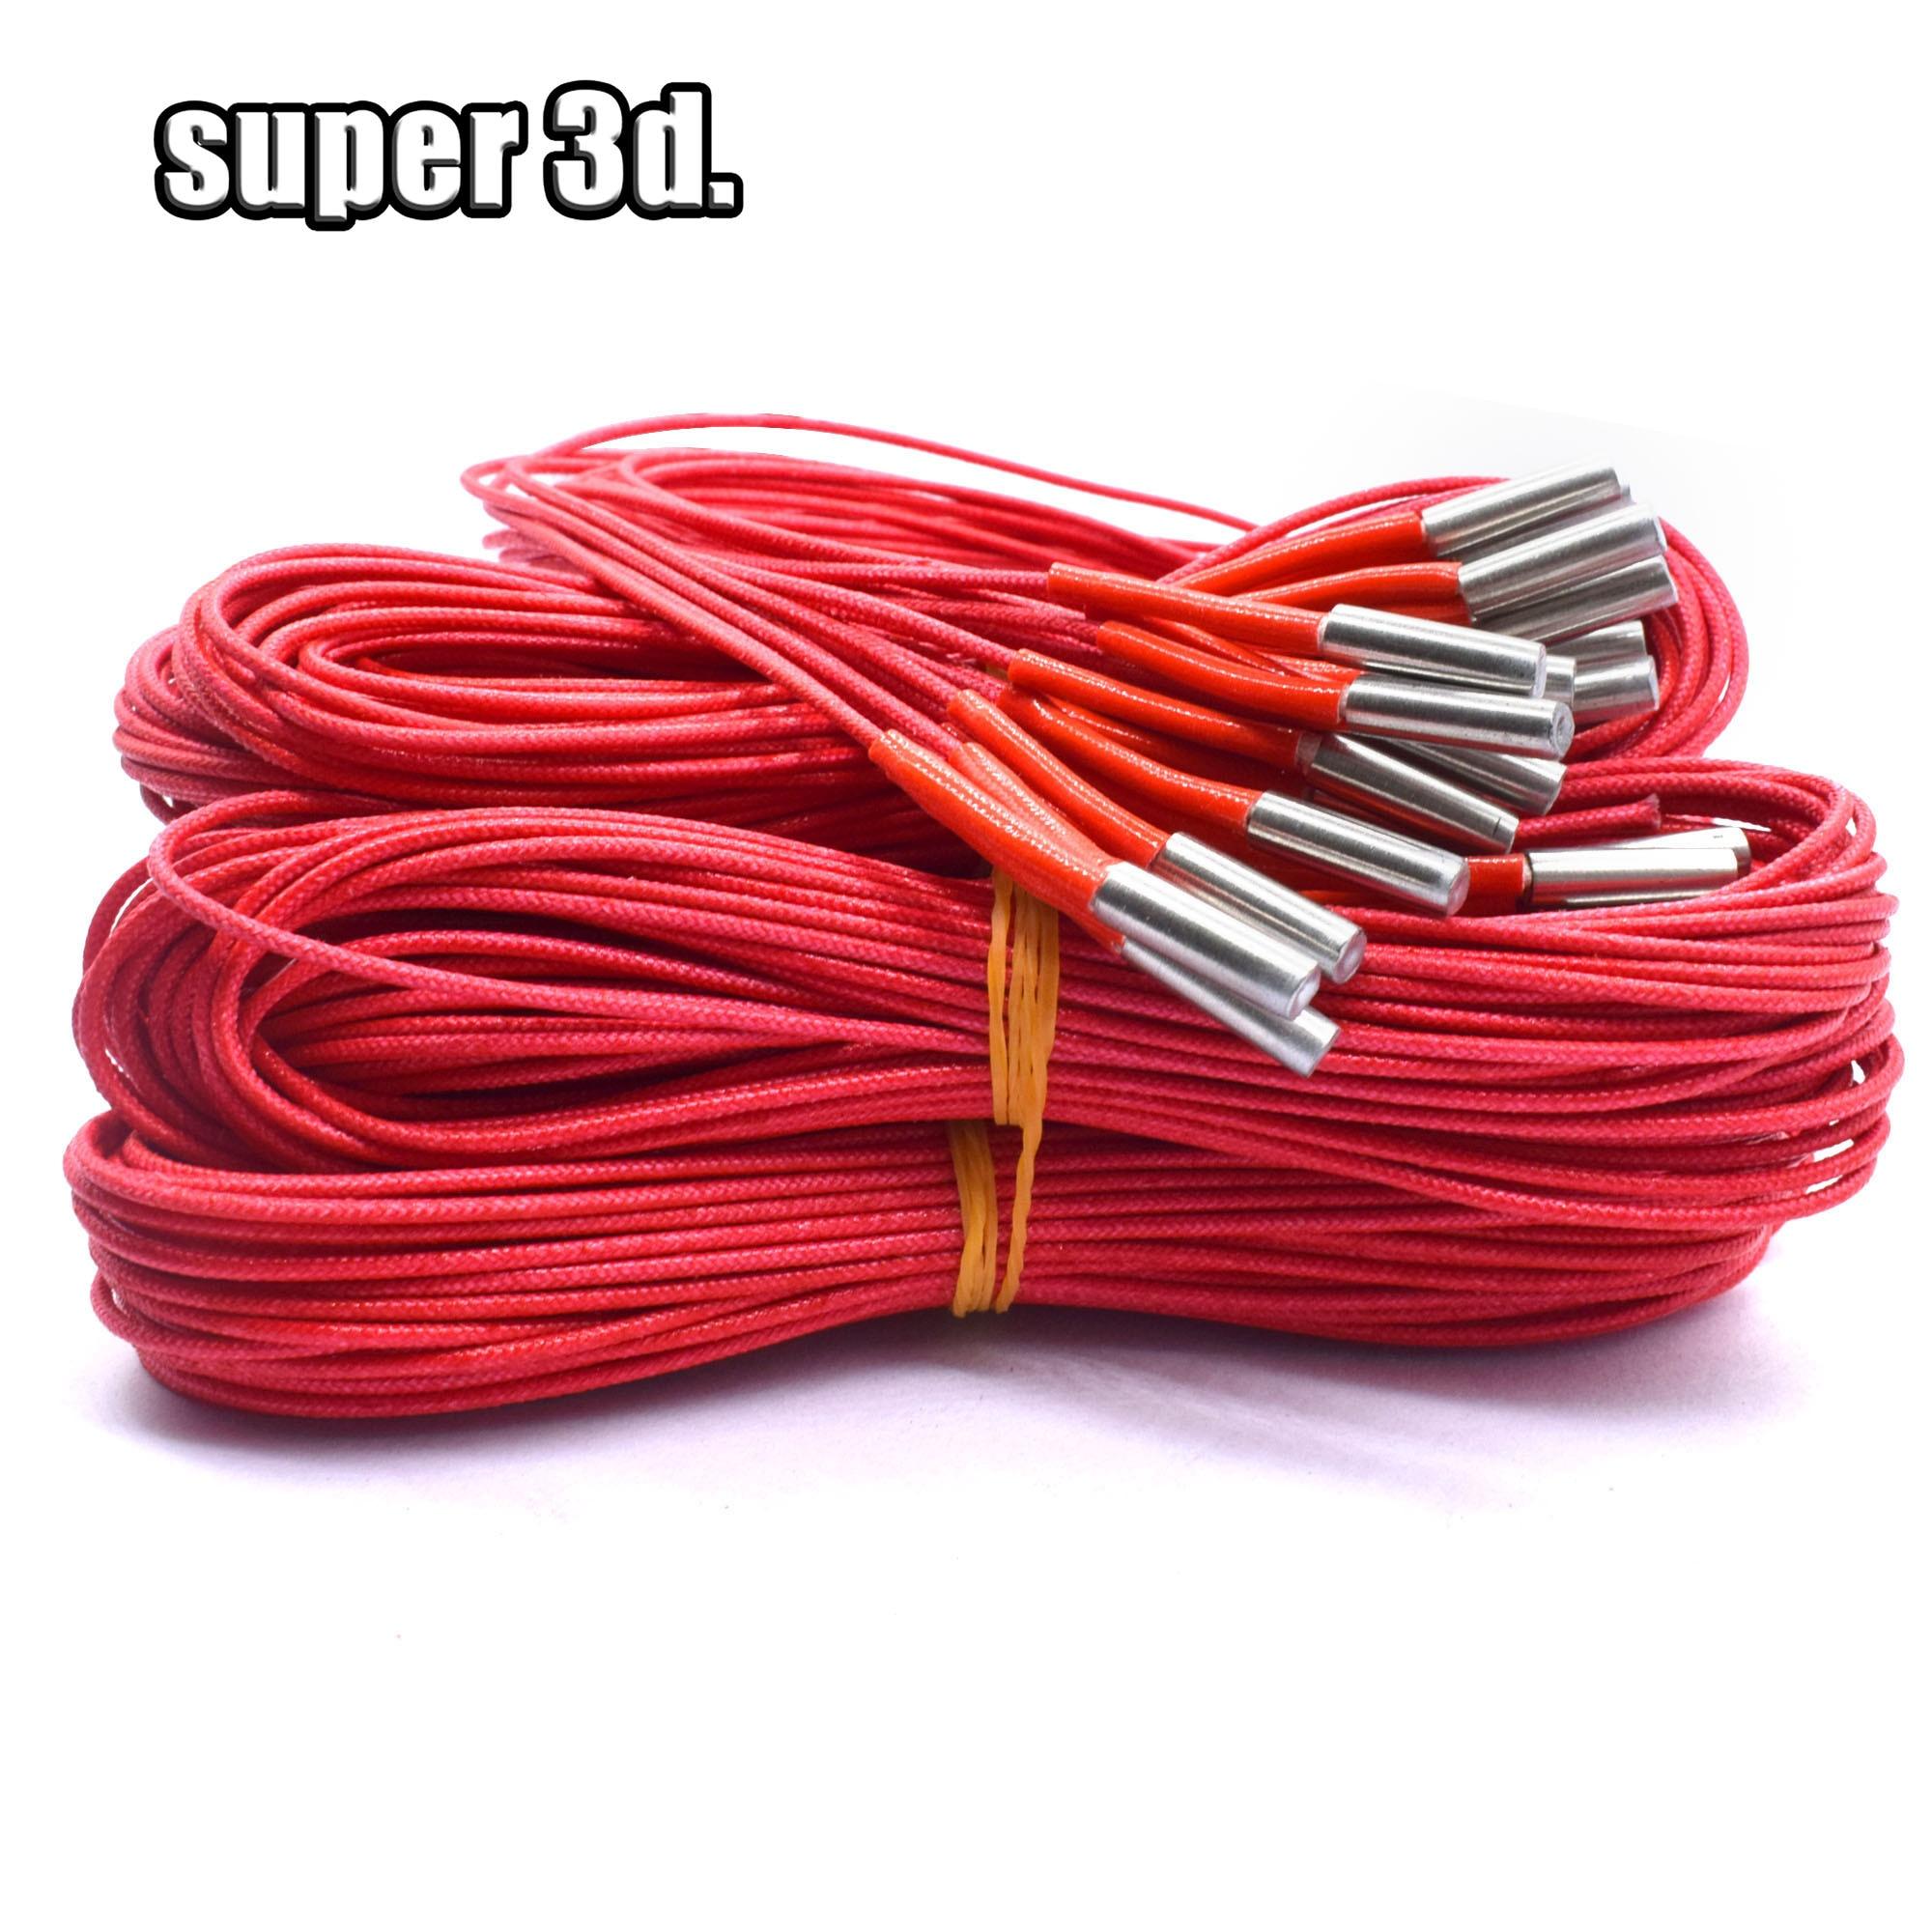 12V/24V 40W Ceramic Cartridge Heater 6mm*20mm 100CM/150CM Cable Lentgth For Extruder 3D Printers Parts Heating Tube